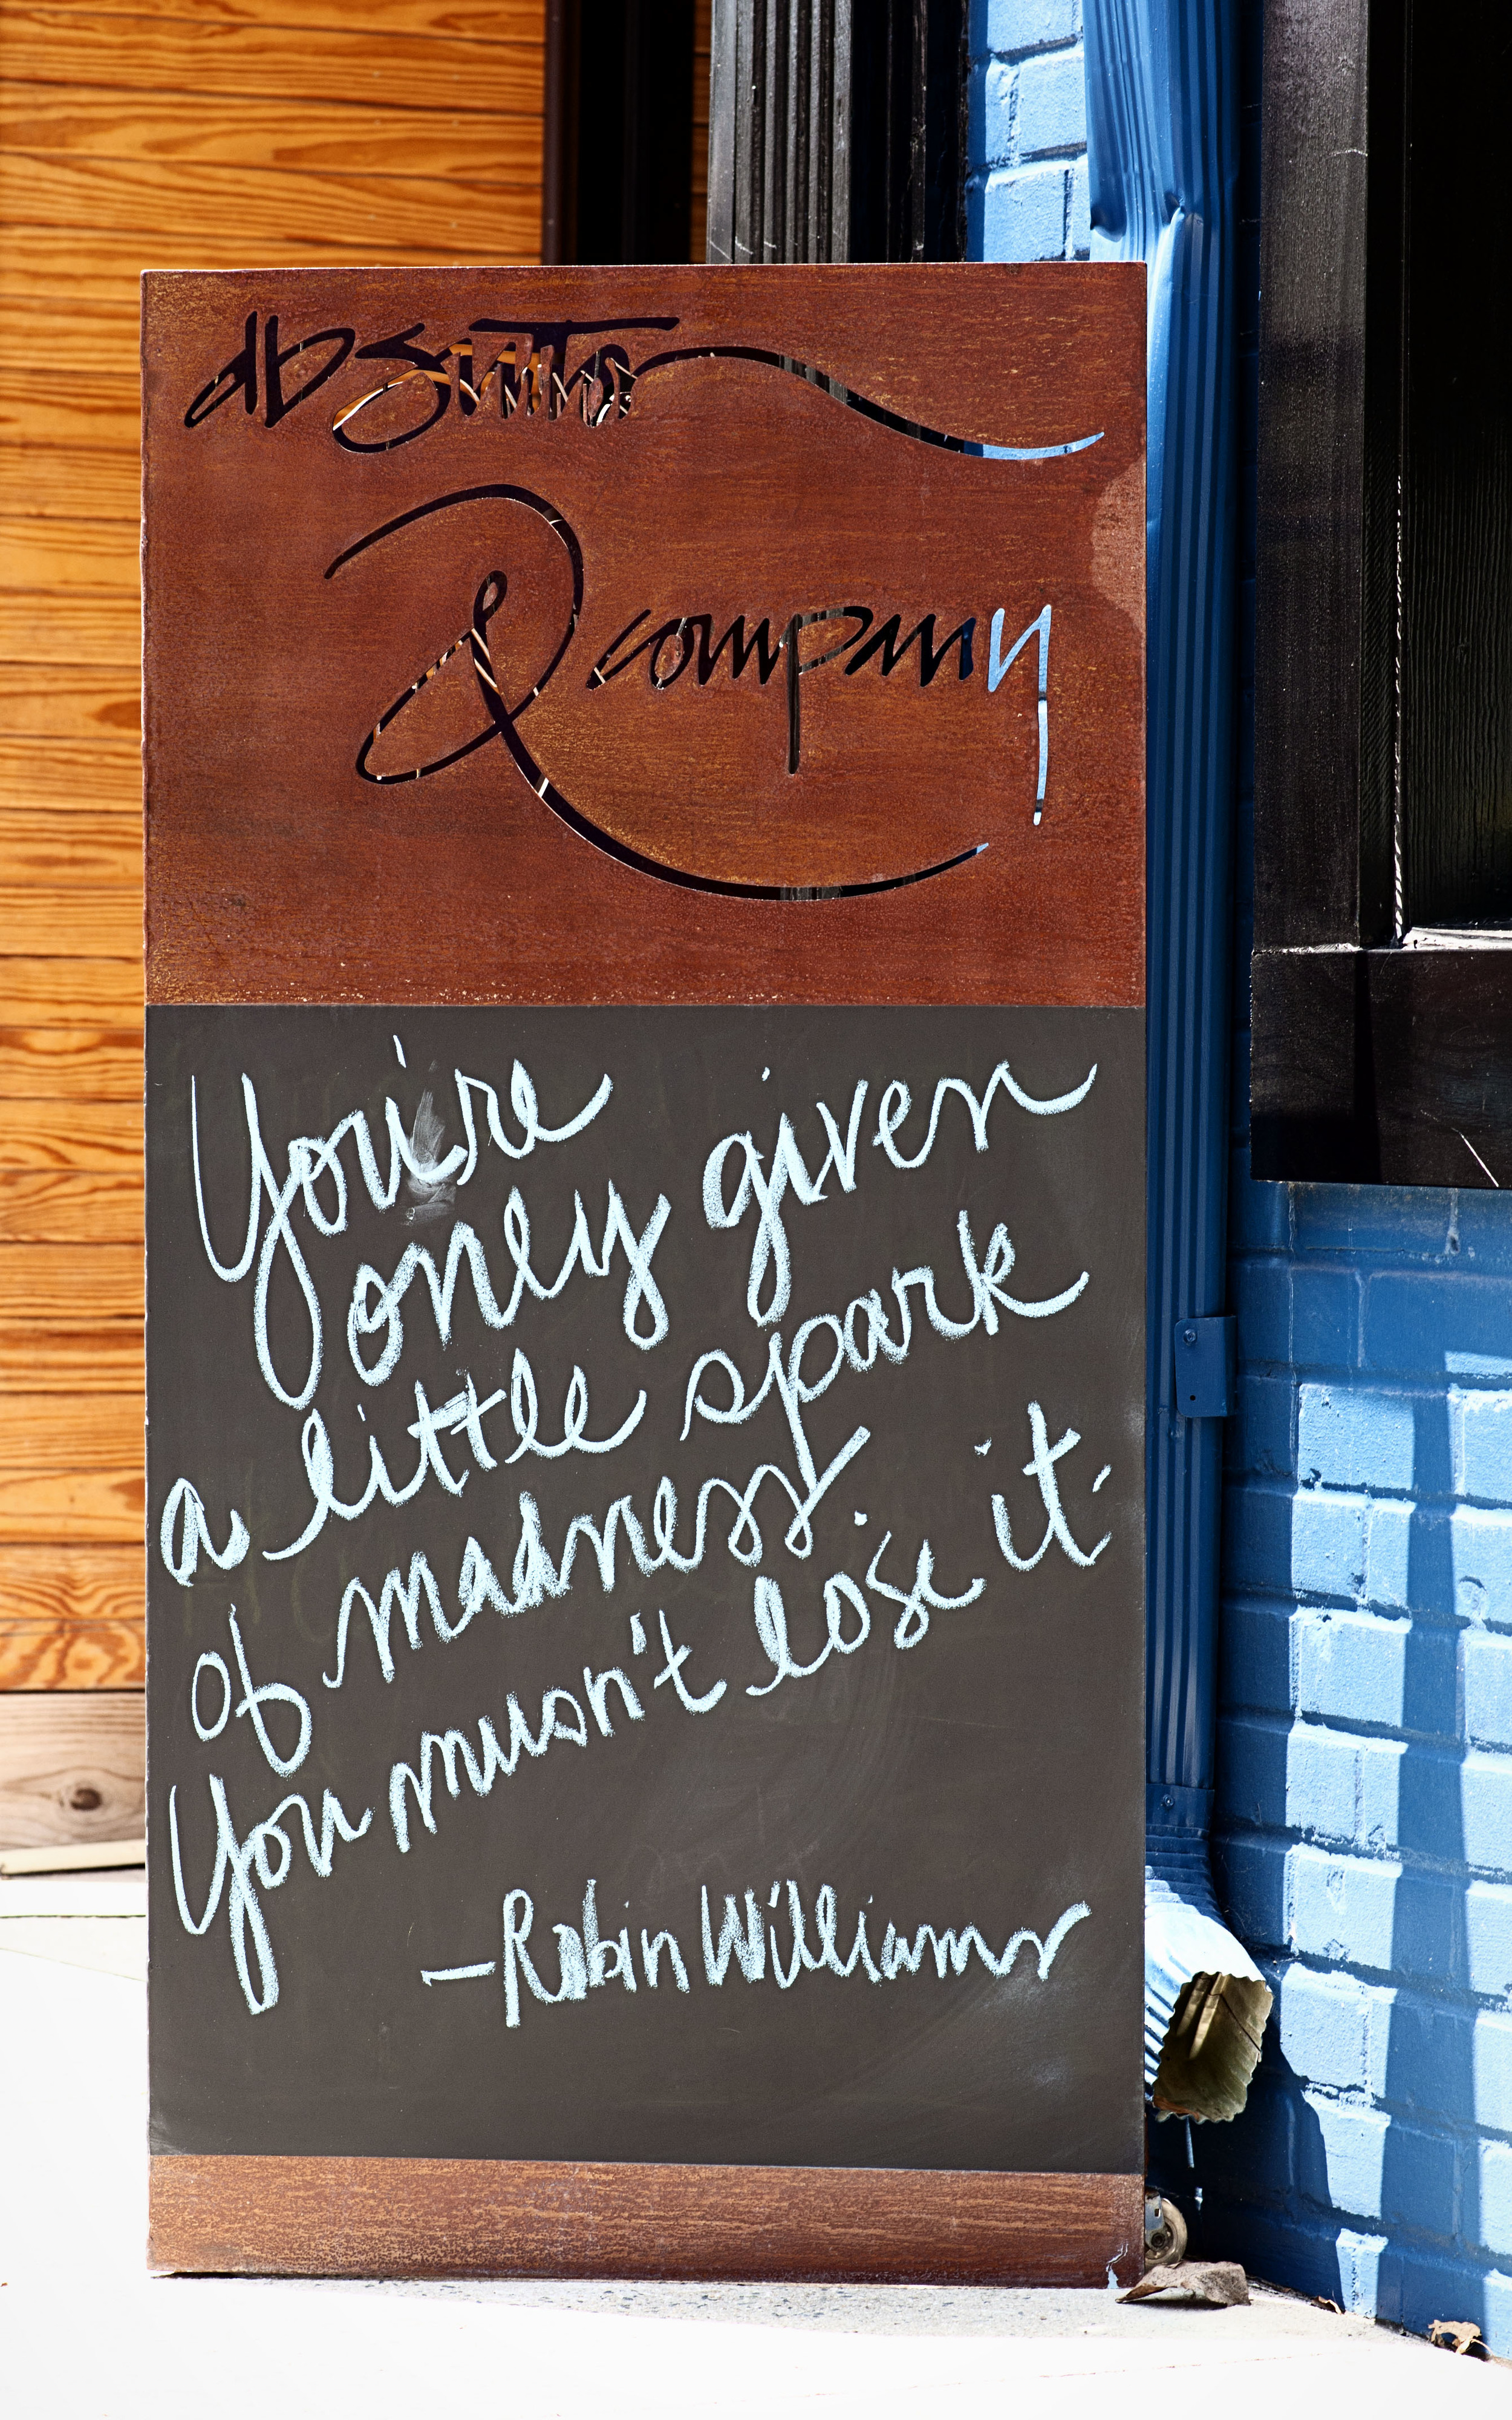 RobinWilliams